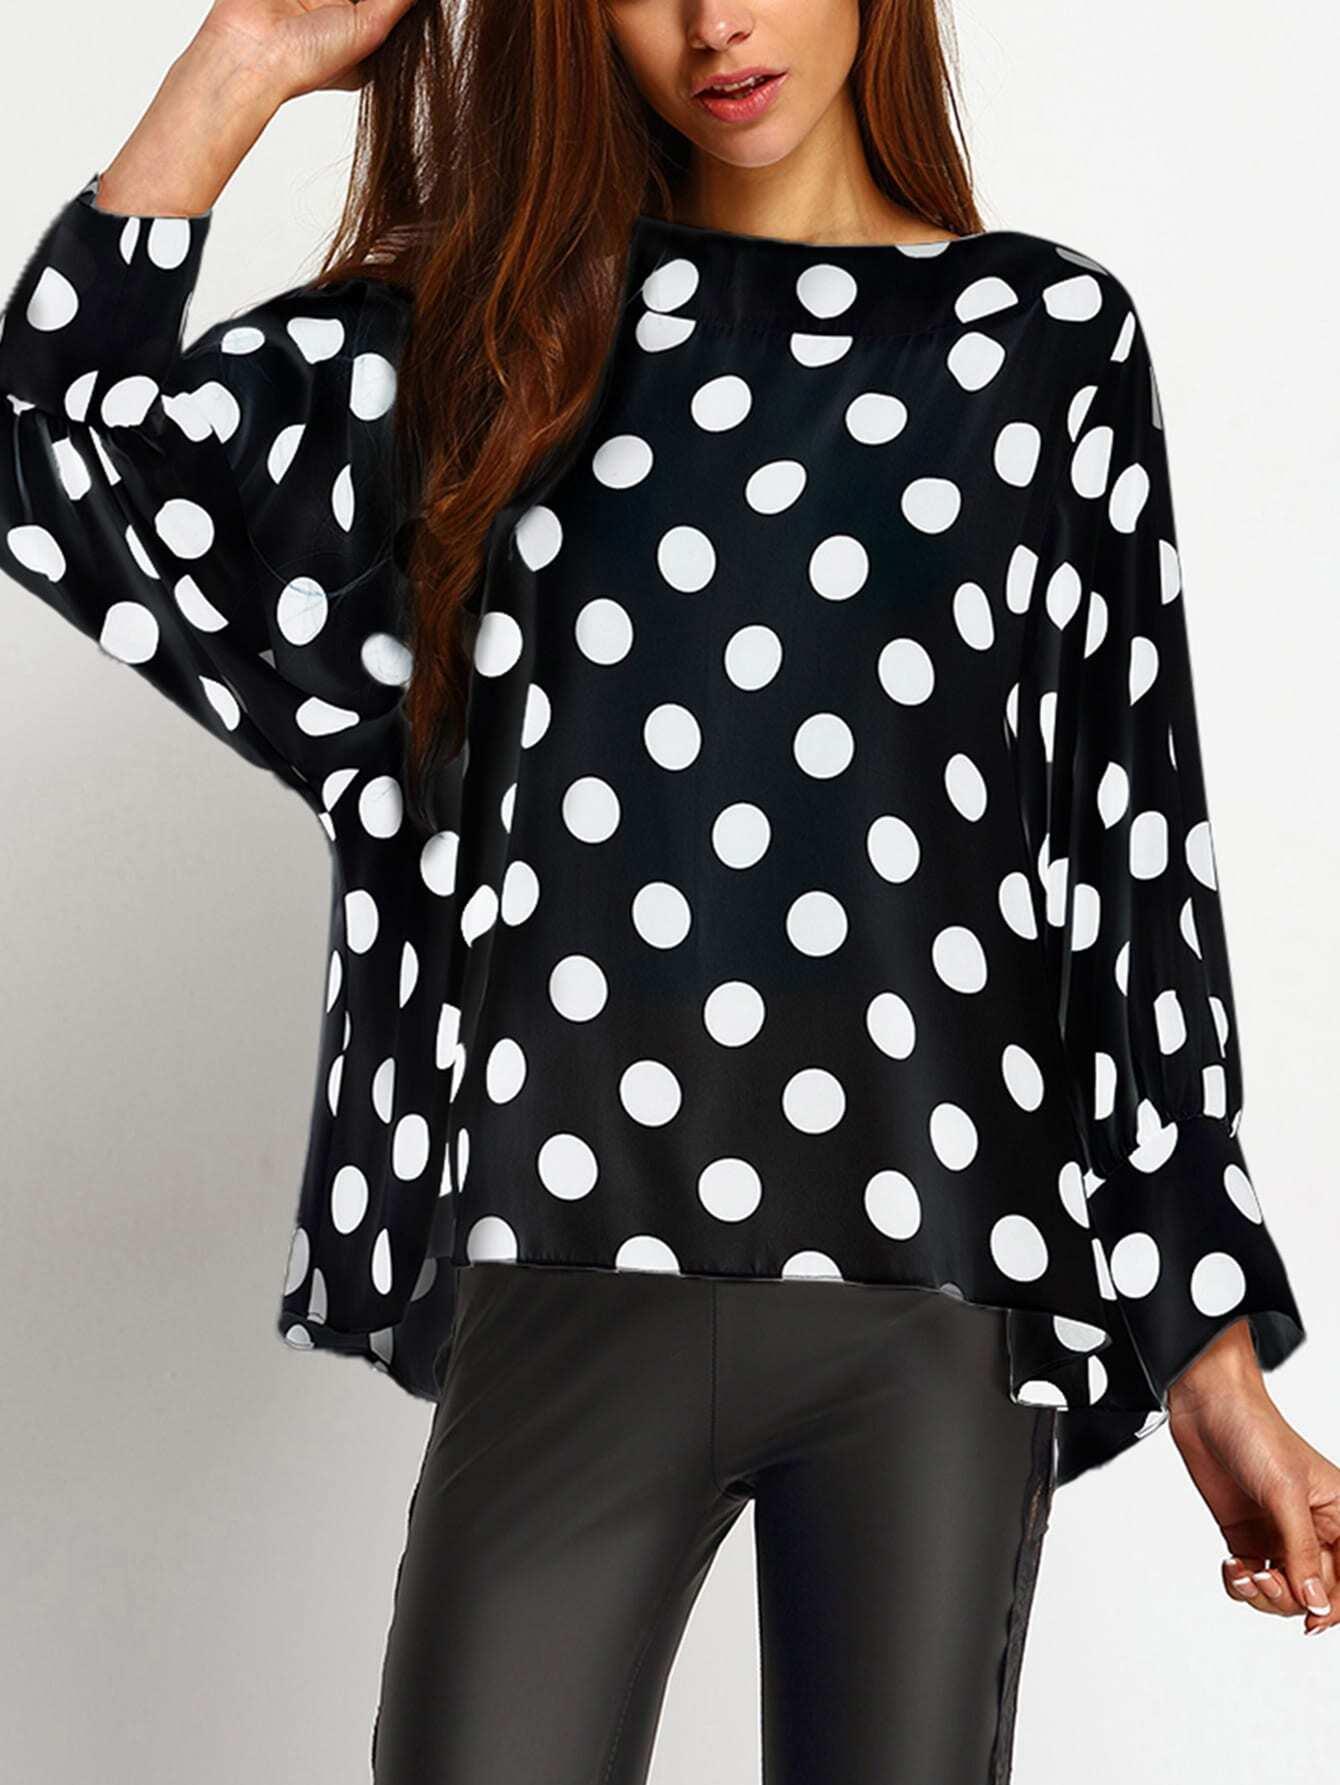 blouse161024450_1